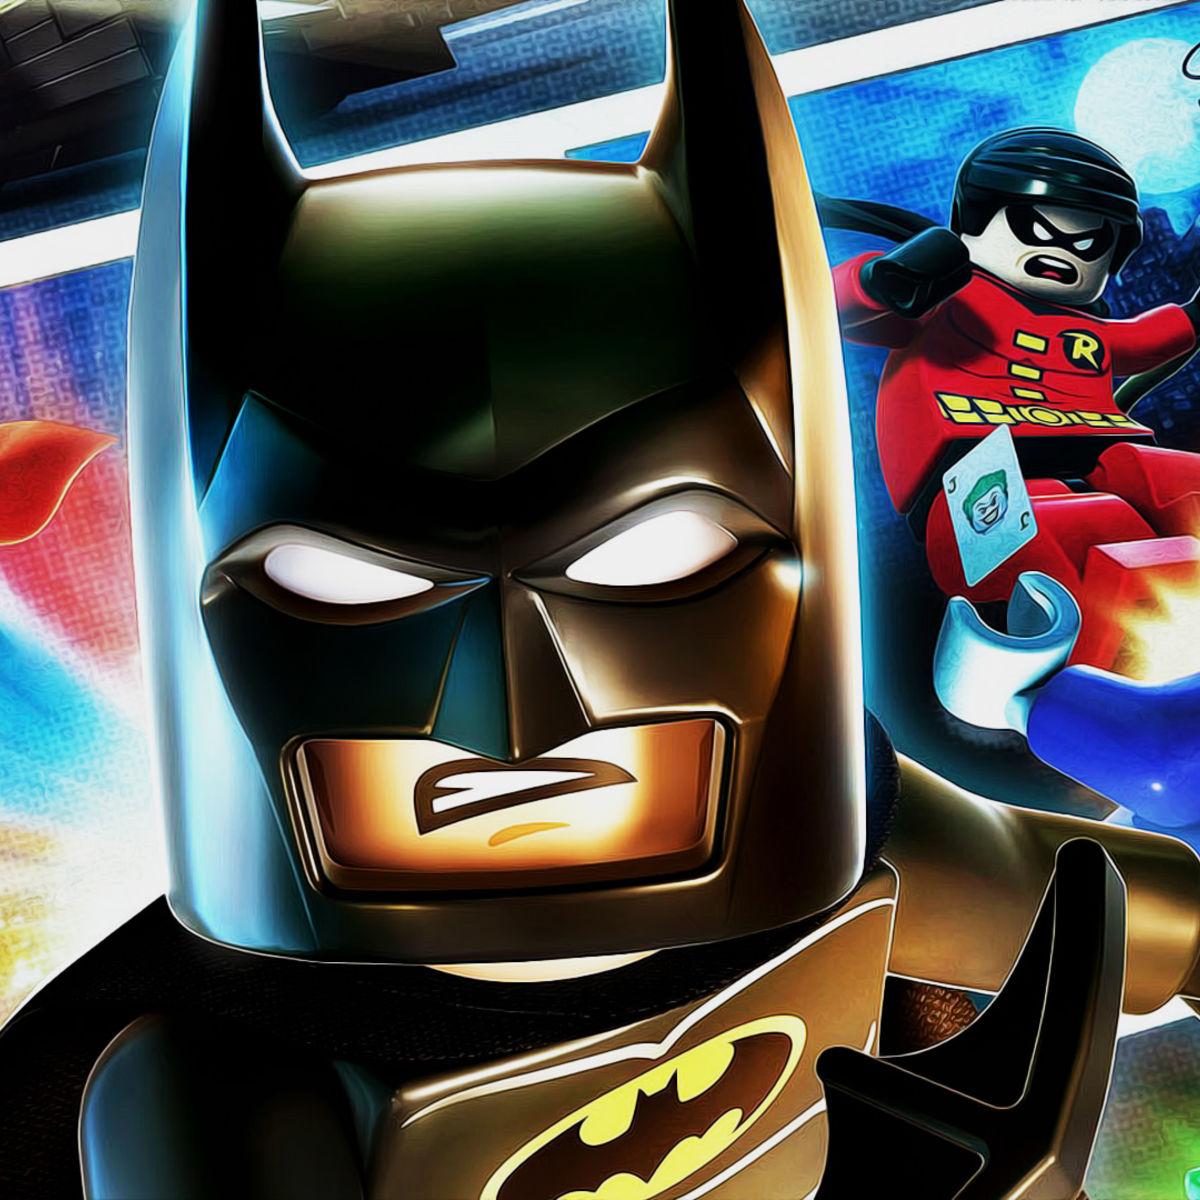 The-Lego-Movie-Wallpaper-Batman-Picture.jpg